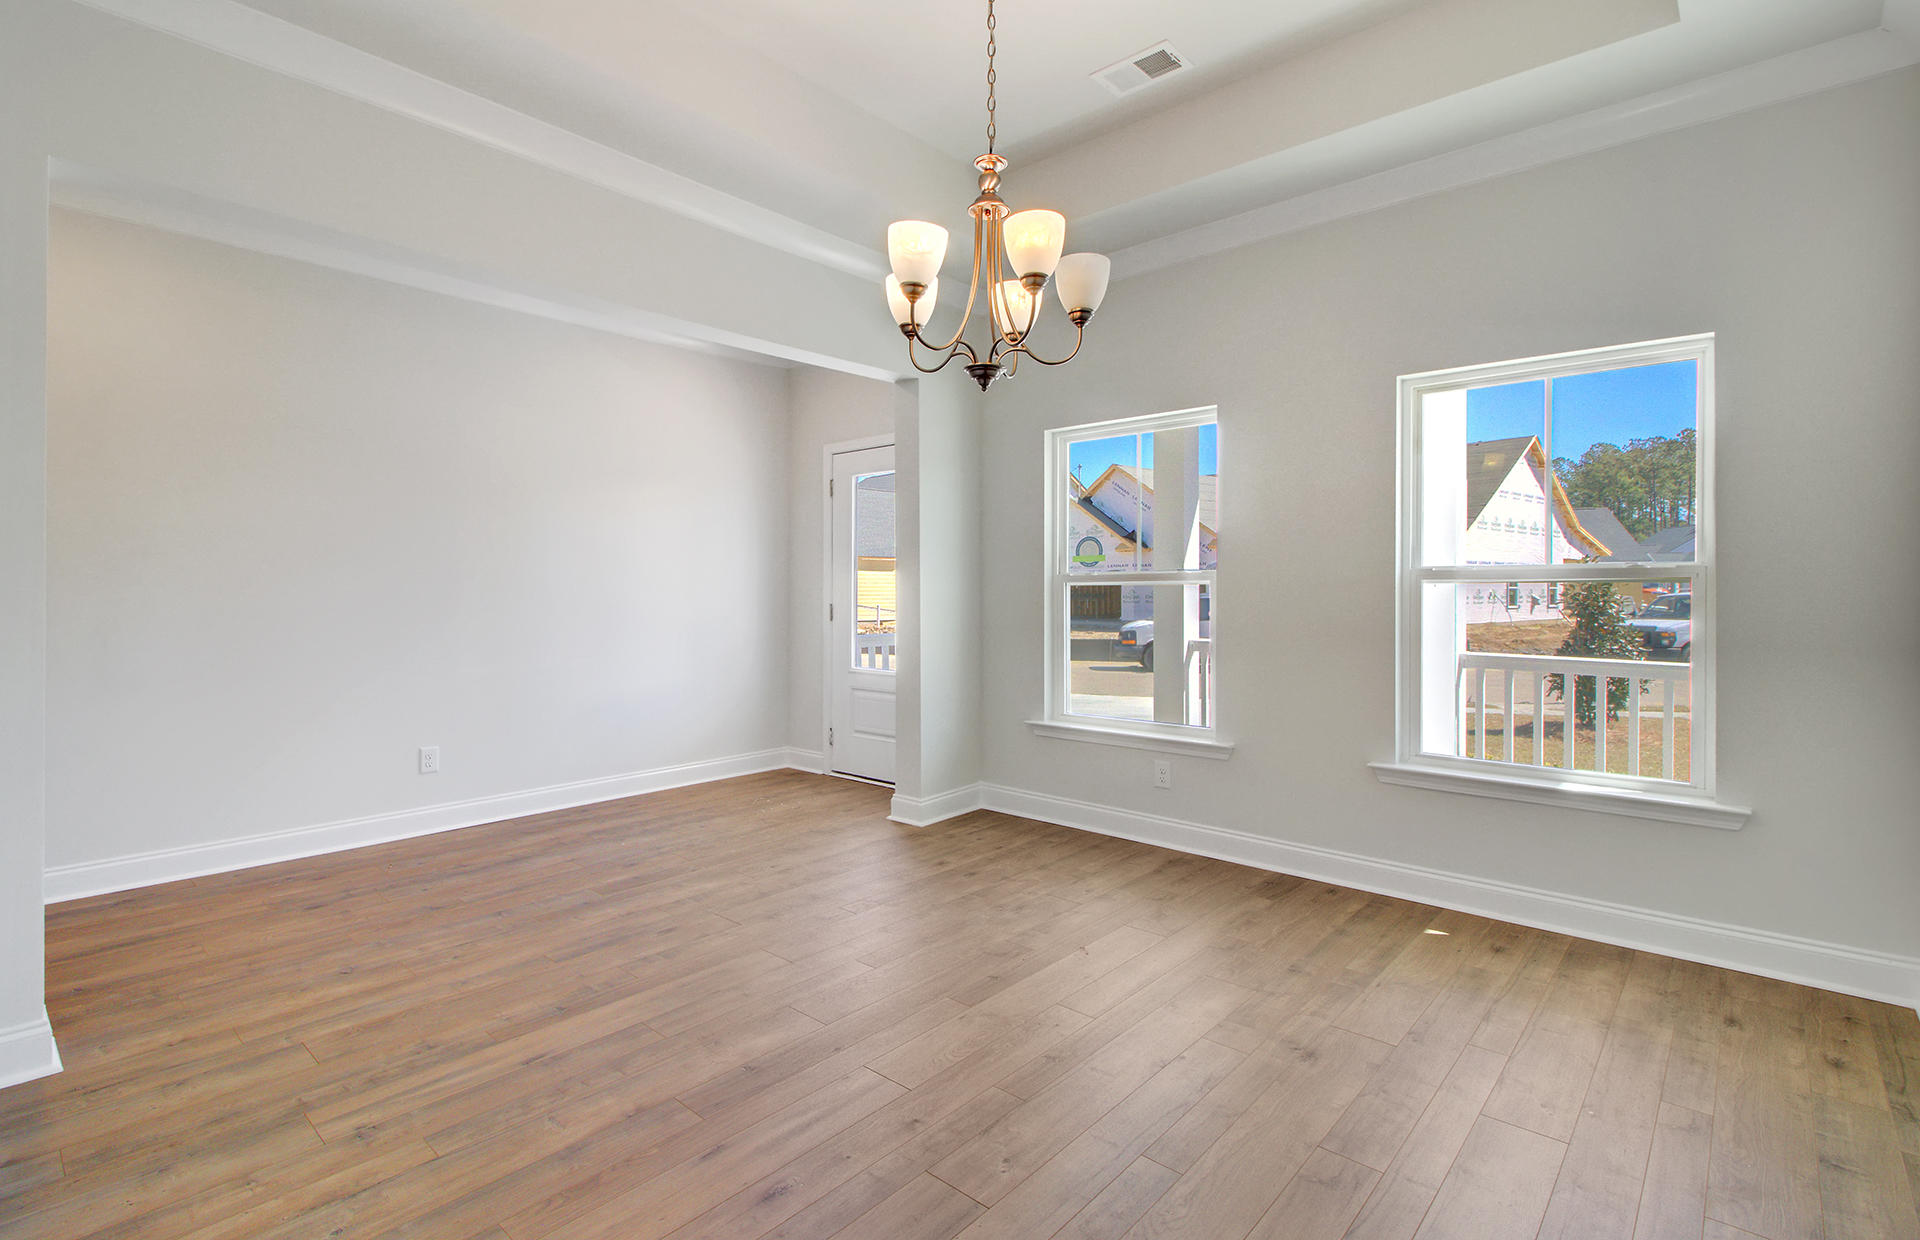 Park West Homes For Sale - 3062 Rice Field, Mount Pleasant, SC - 23